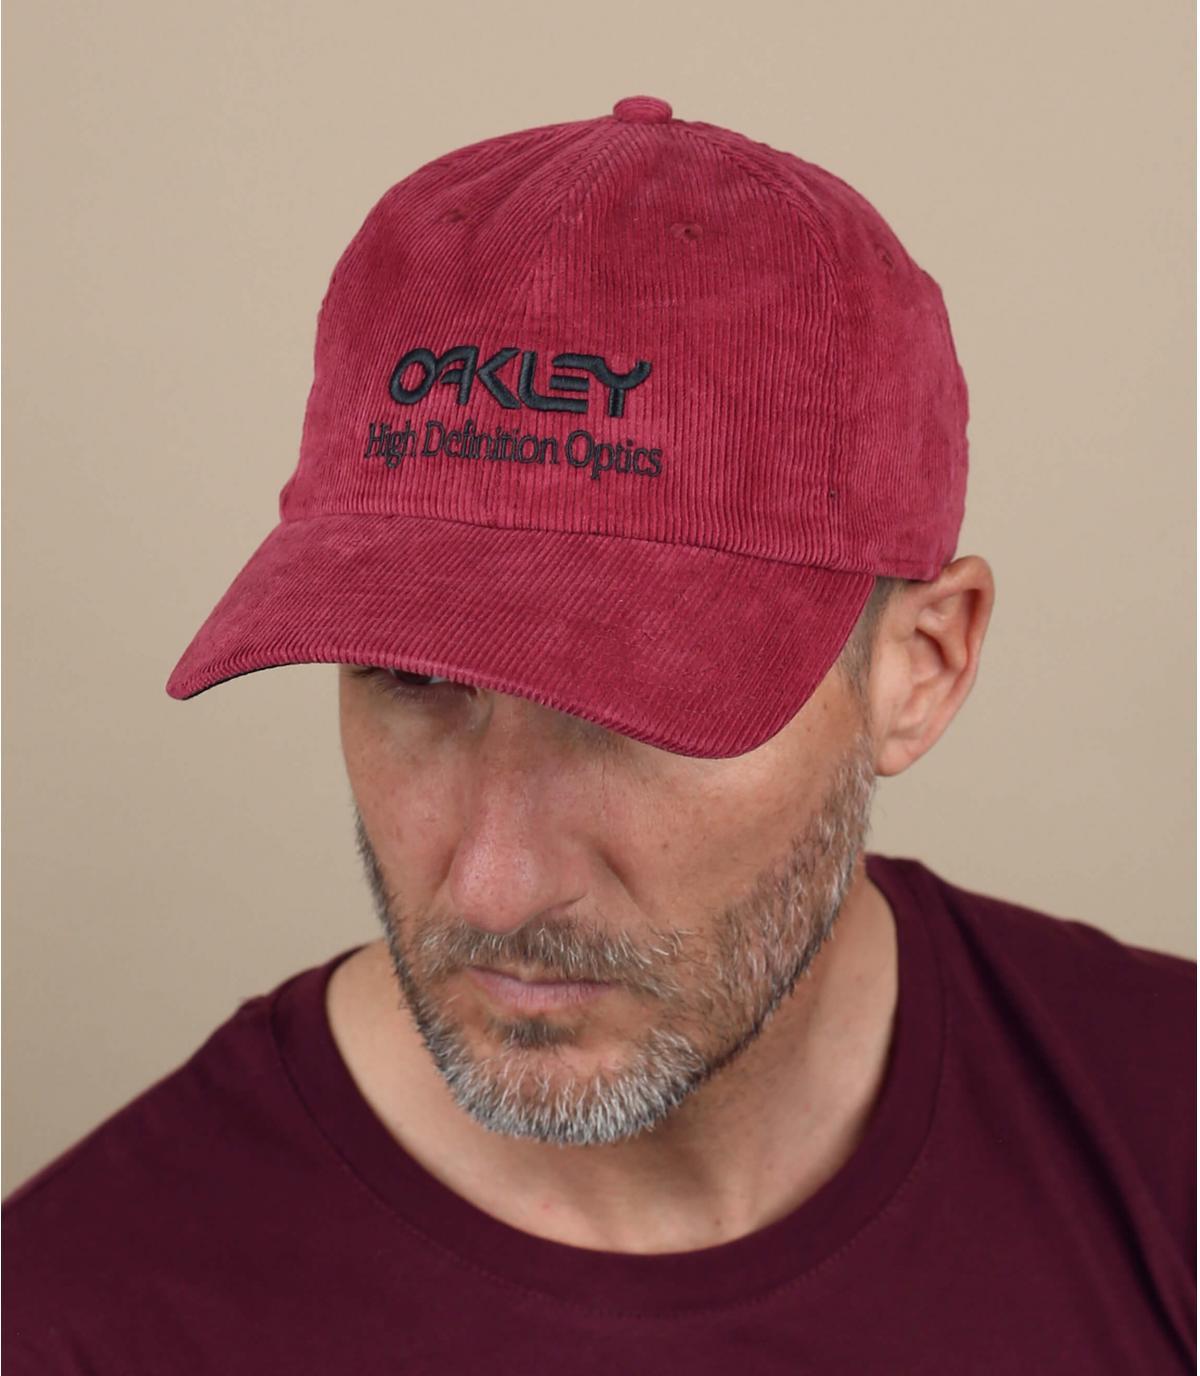 casquette Oakley velours rouge